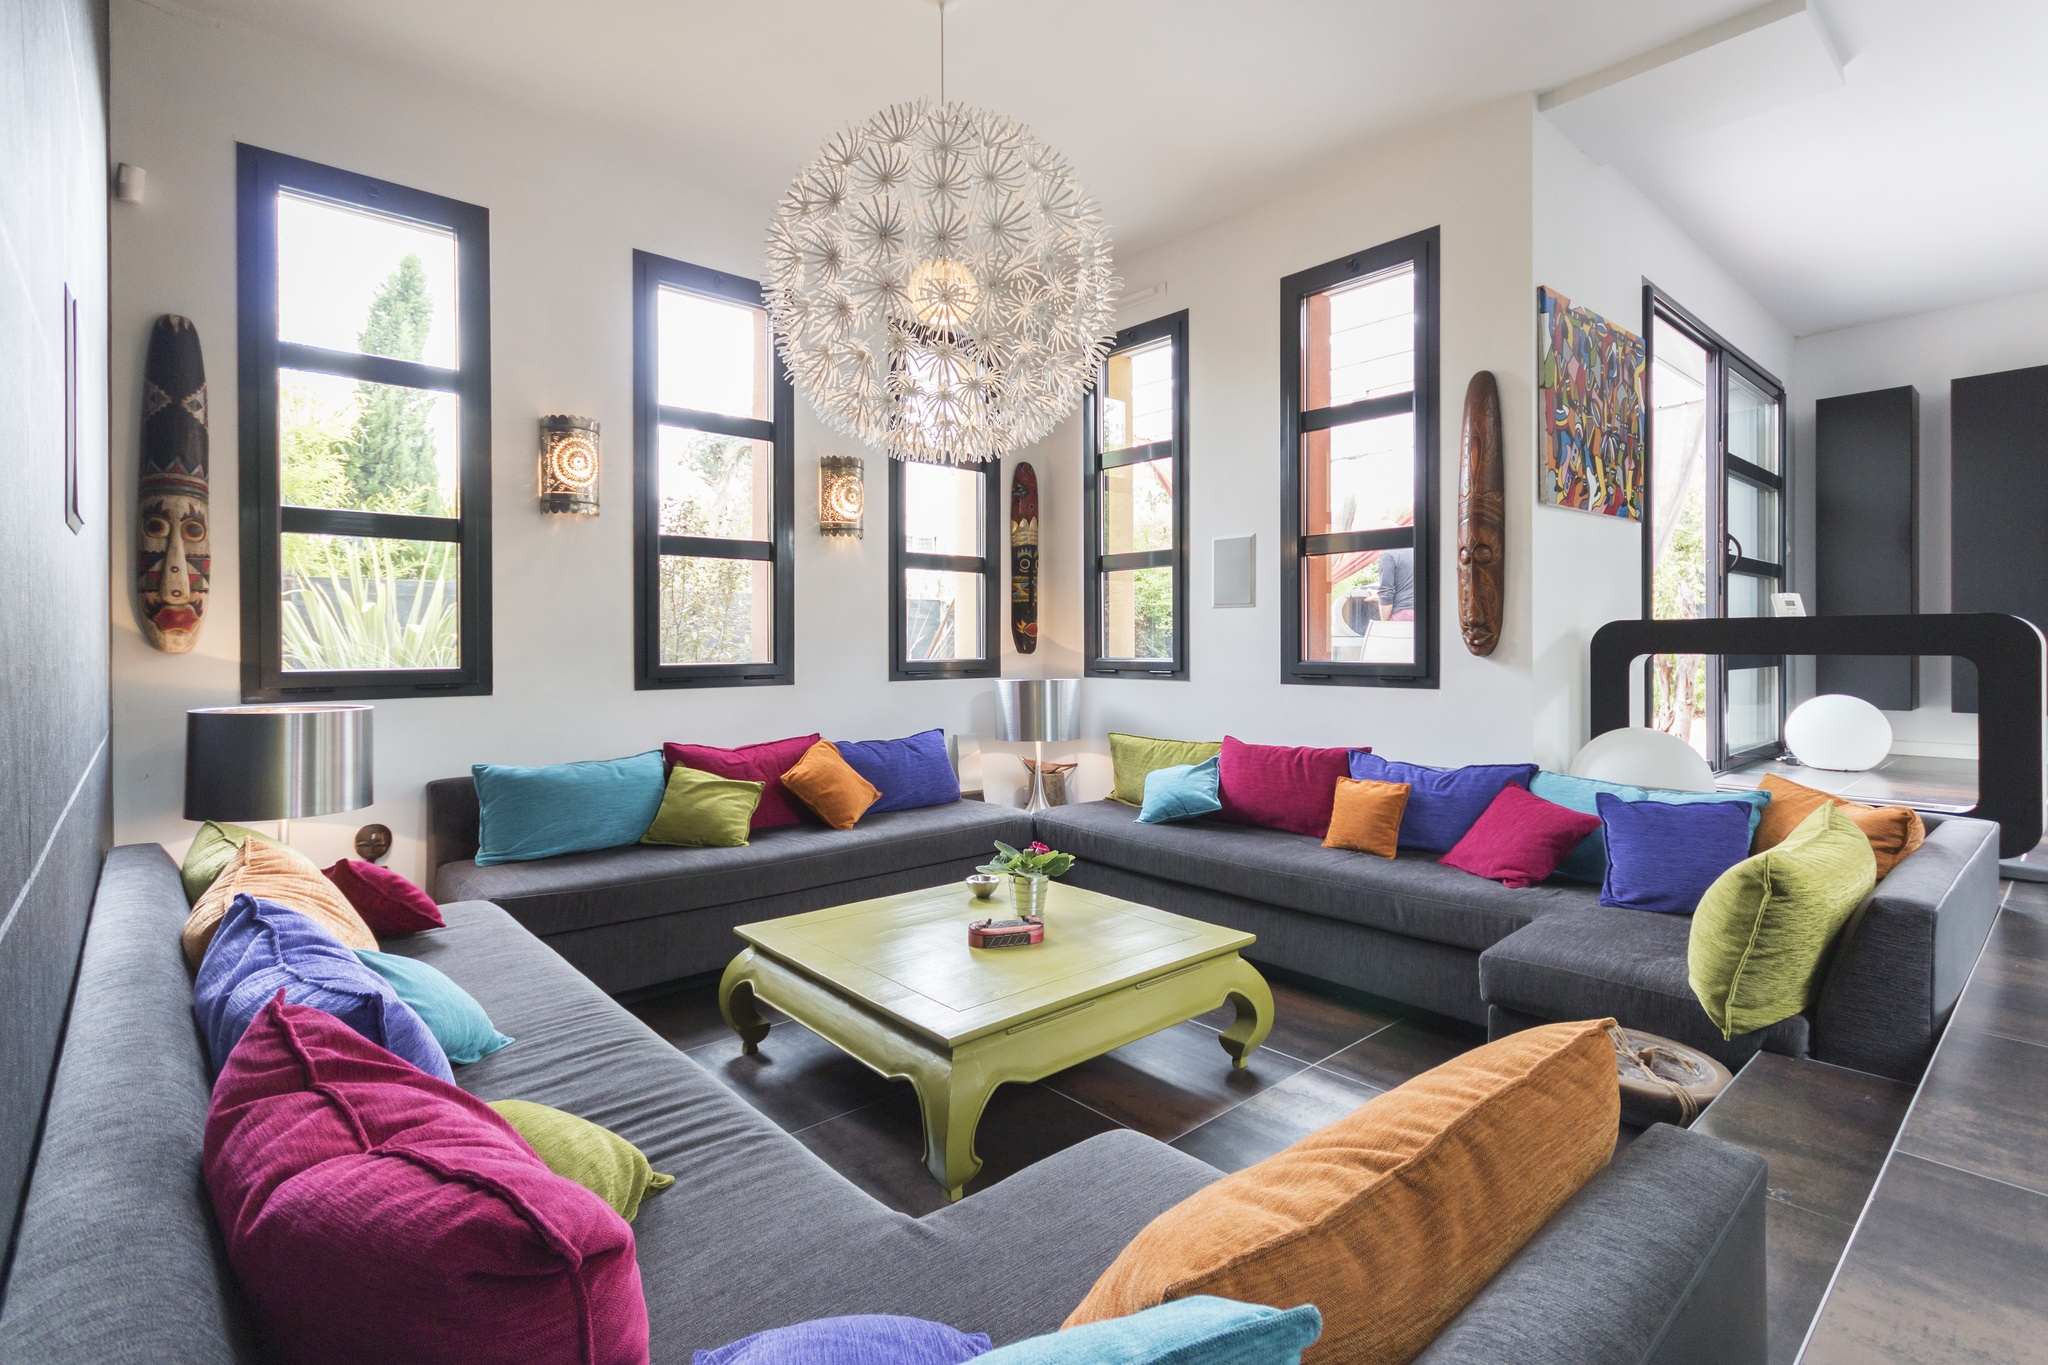 Villa contemporanea a La-Baule - Photo: Steven Baconnais